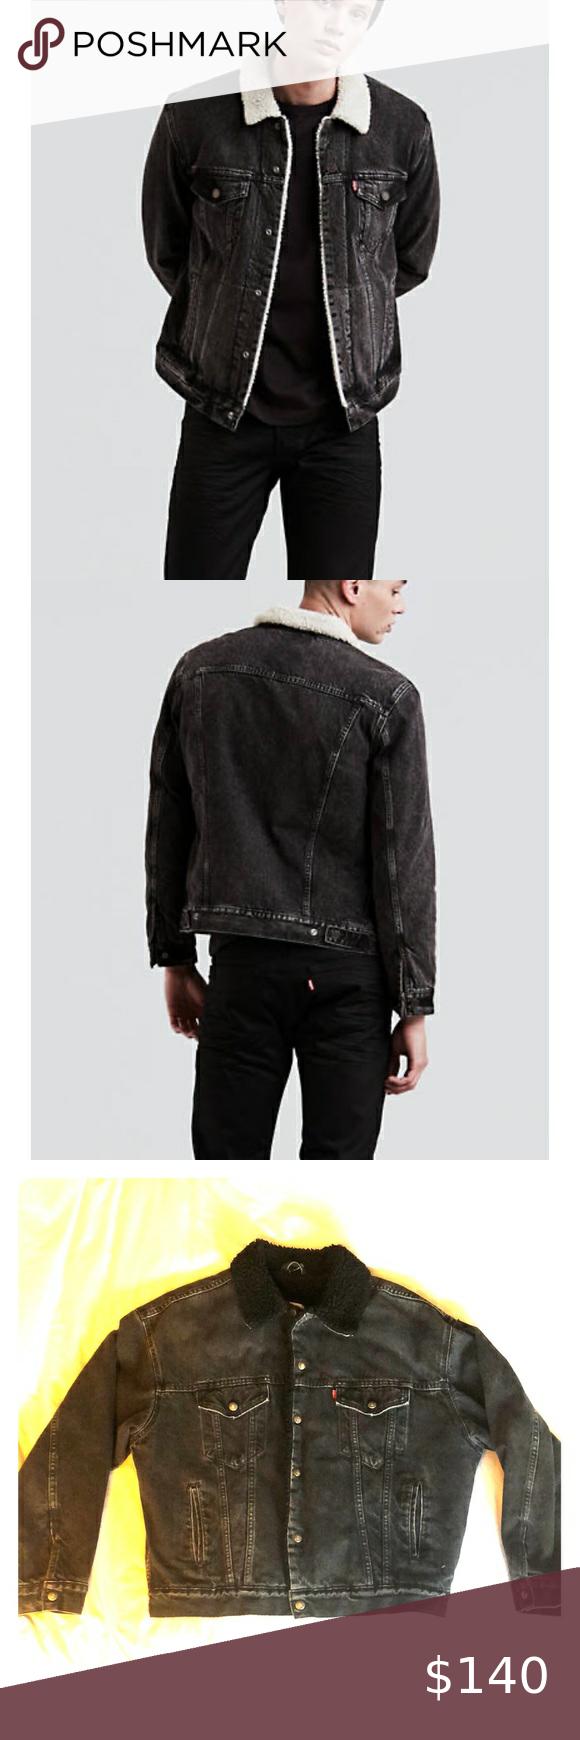 Rare! Levi's Vintage Mens Denim & Sherpa Jacket in 2020